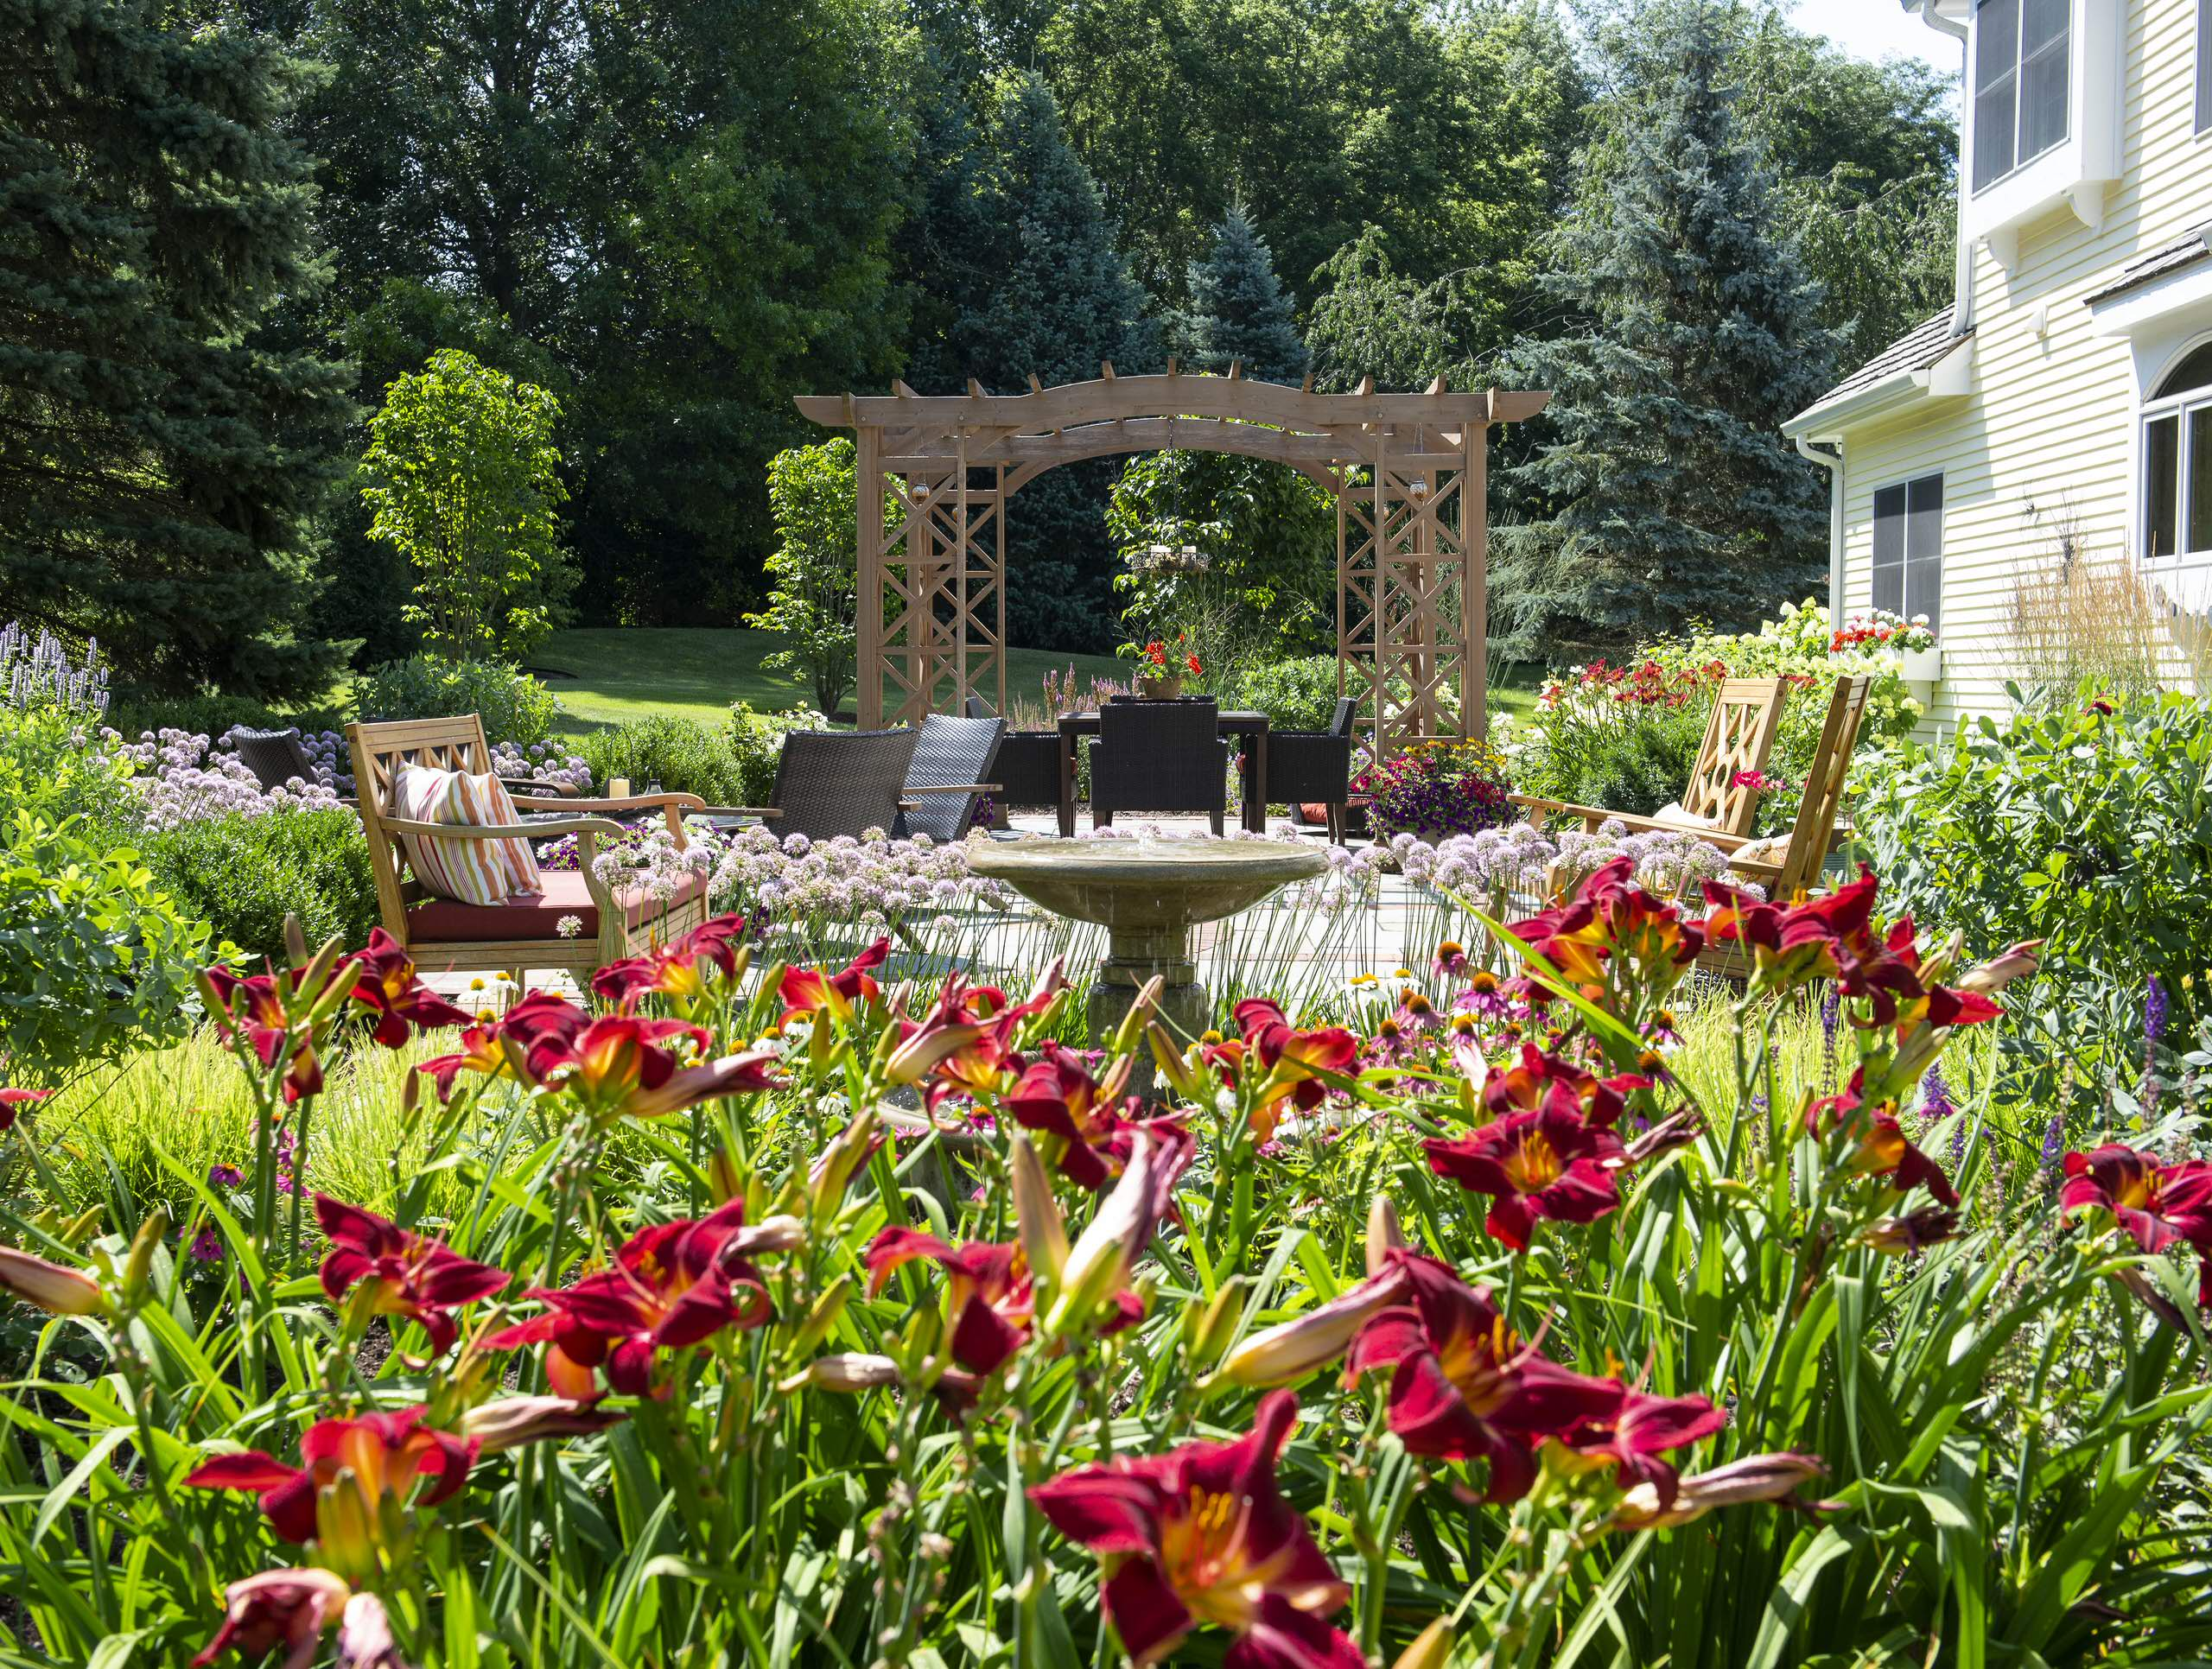 Farmhouse Backyard Landscape - Hawthorn Woods, IL